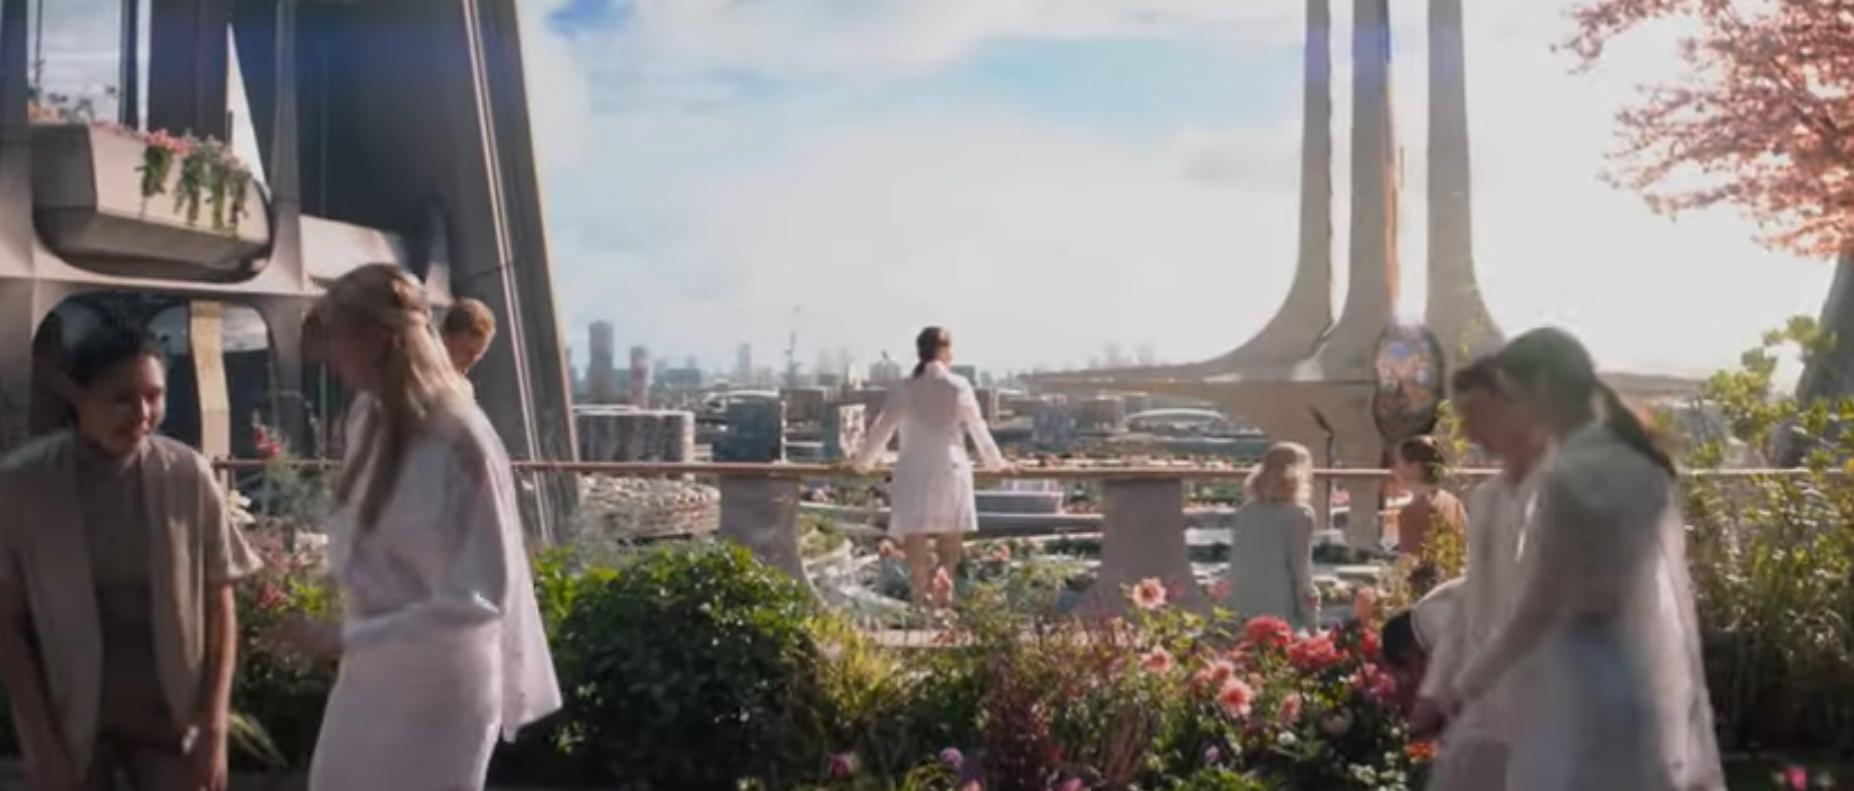 brave new world serie crítica:el planeta feliz que se estrenó en HBO Portugal 3